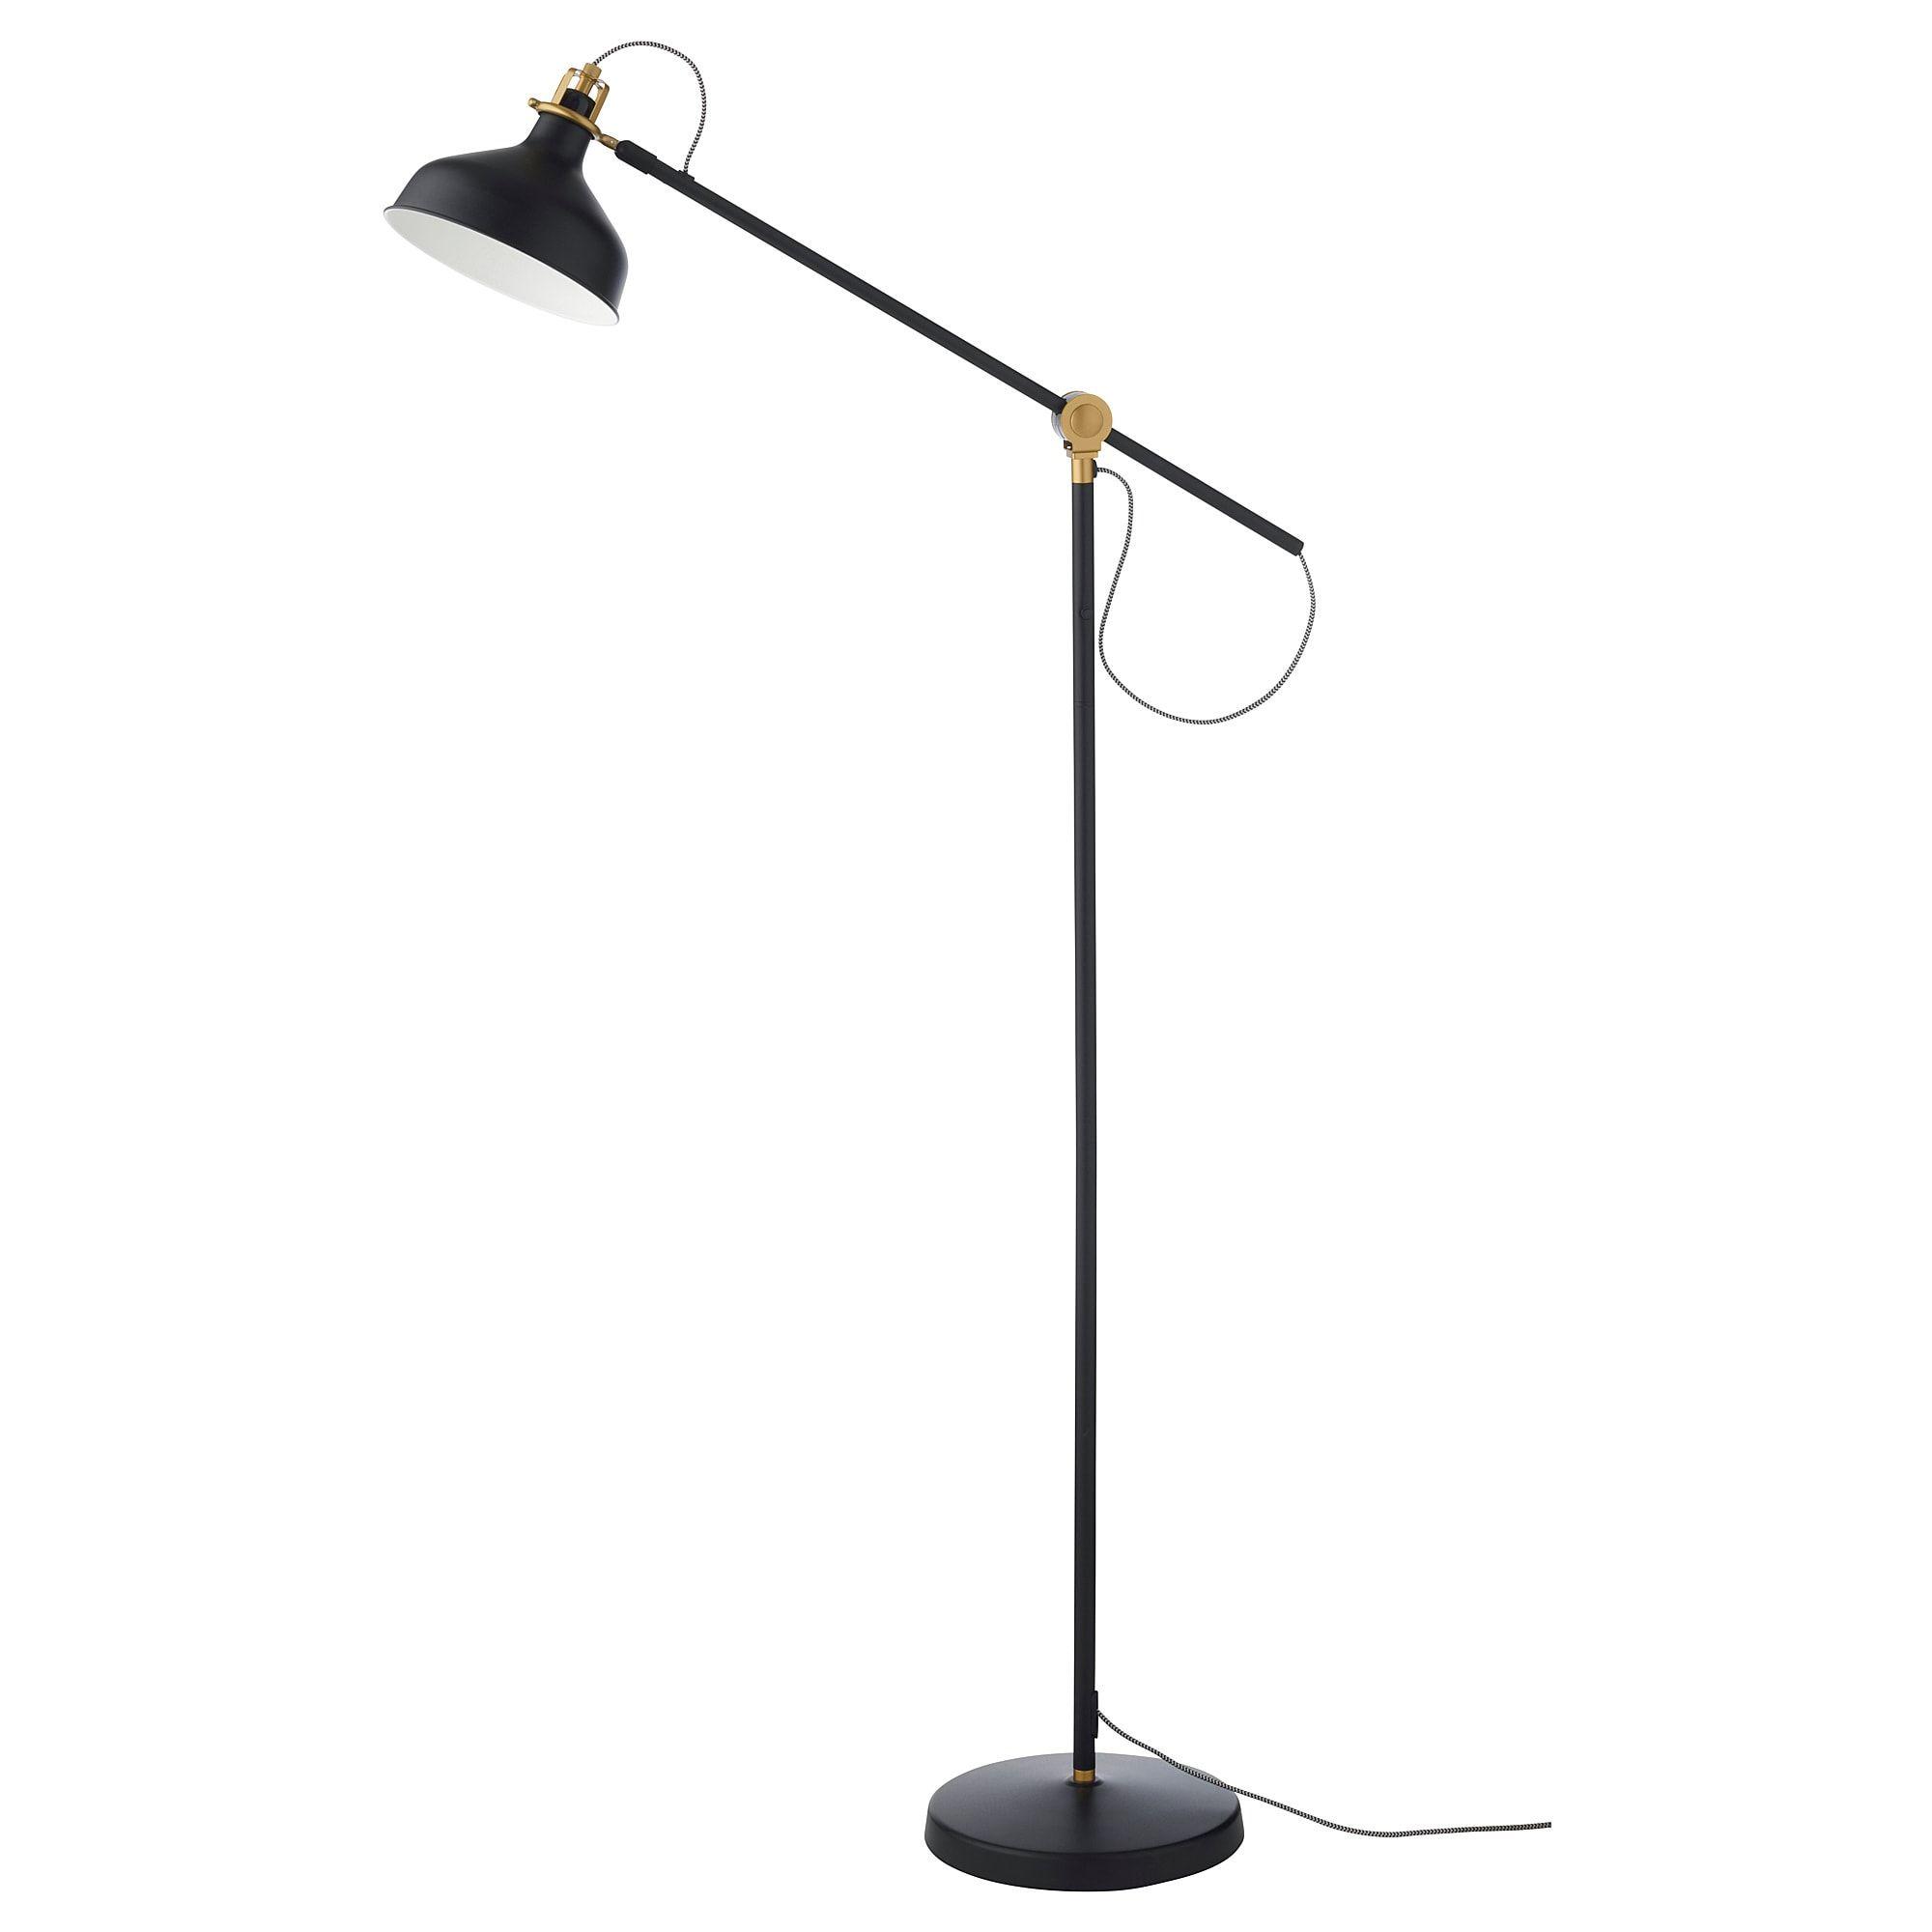 Full Size of Stehlampen Ikea Lampe Stehlampe Papier Moderne Wien Schweiz Dimmbar Lampenschirm Lampen Led Wohnzimmer Dimmen Schirm Ranarp Stand Leseleuchte Schwarz Wohnzimmer Stehlampen Ikea